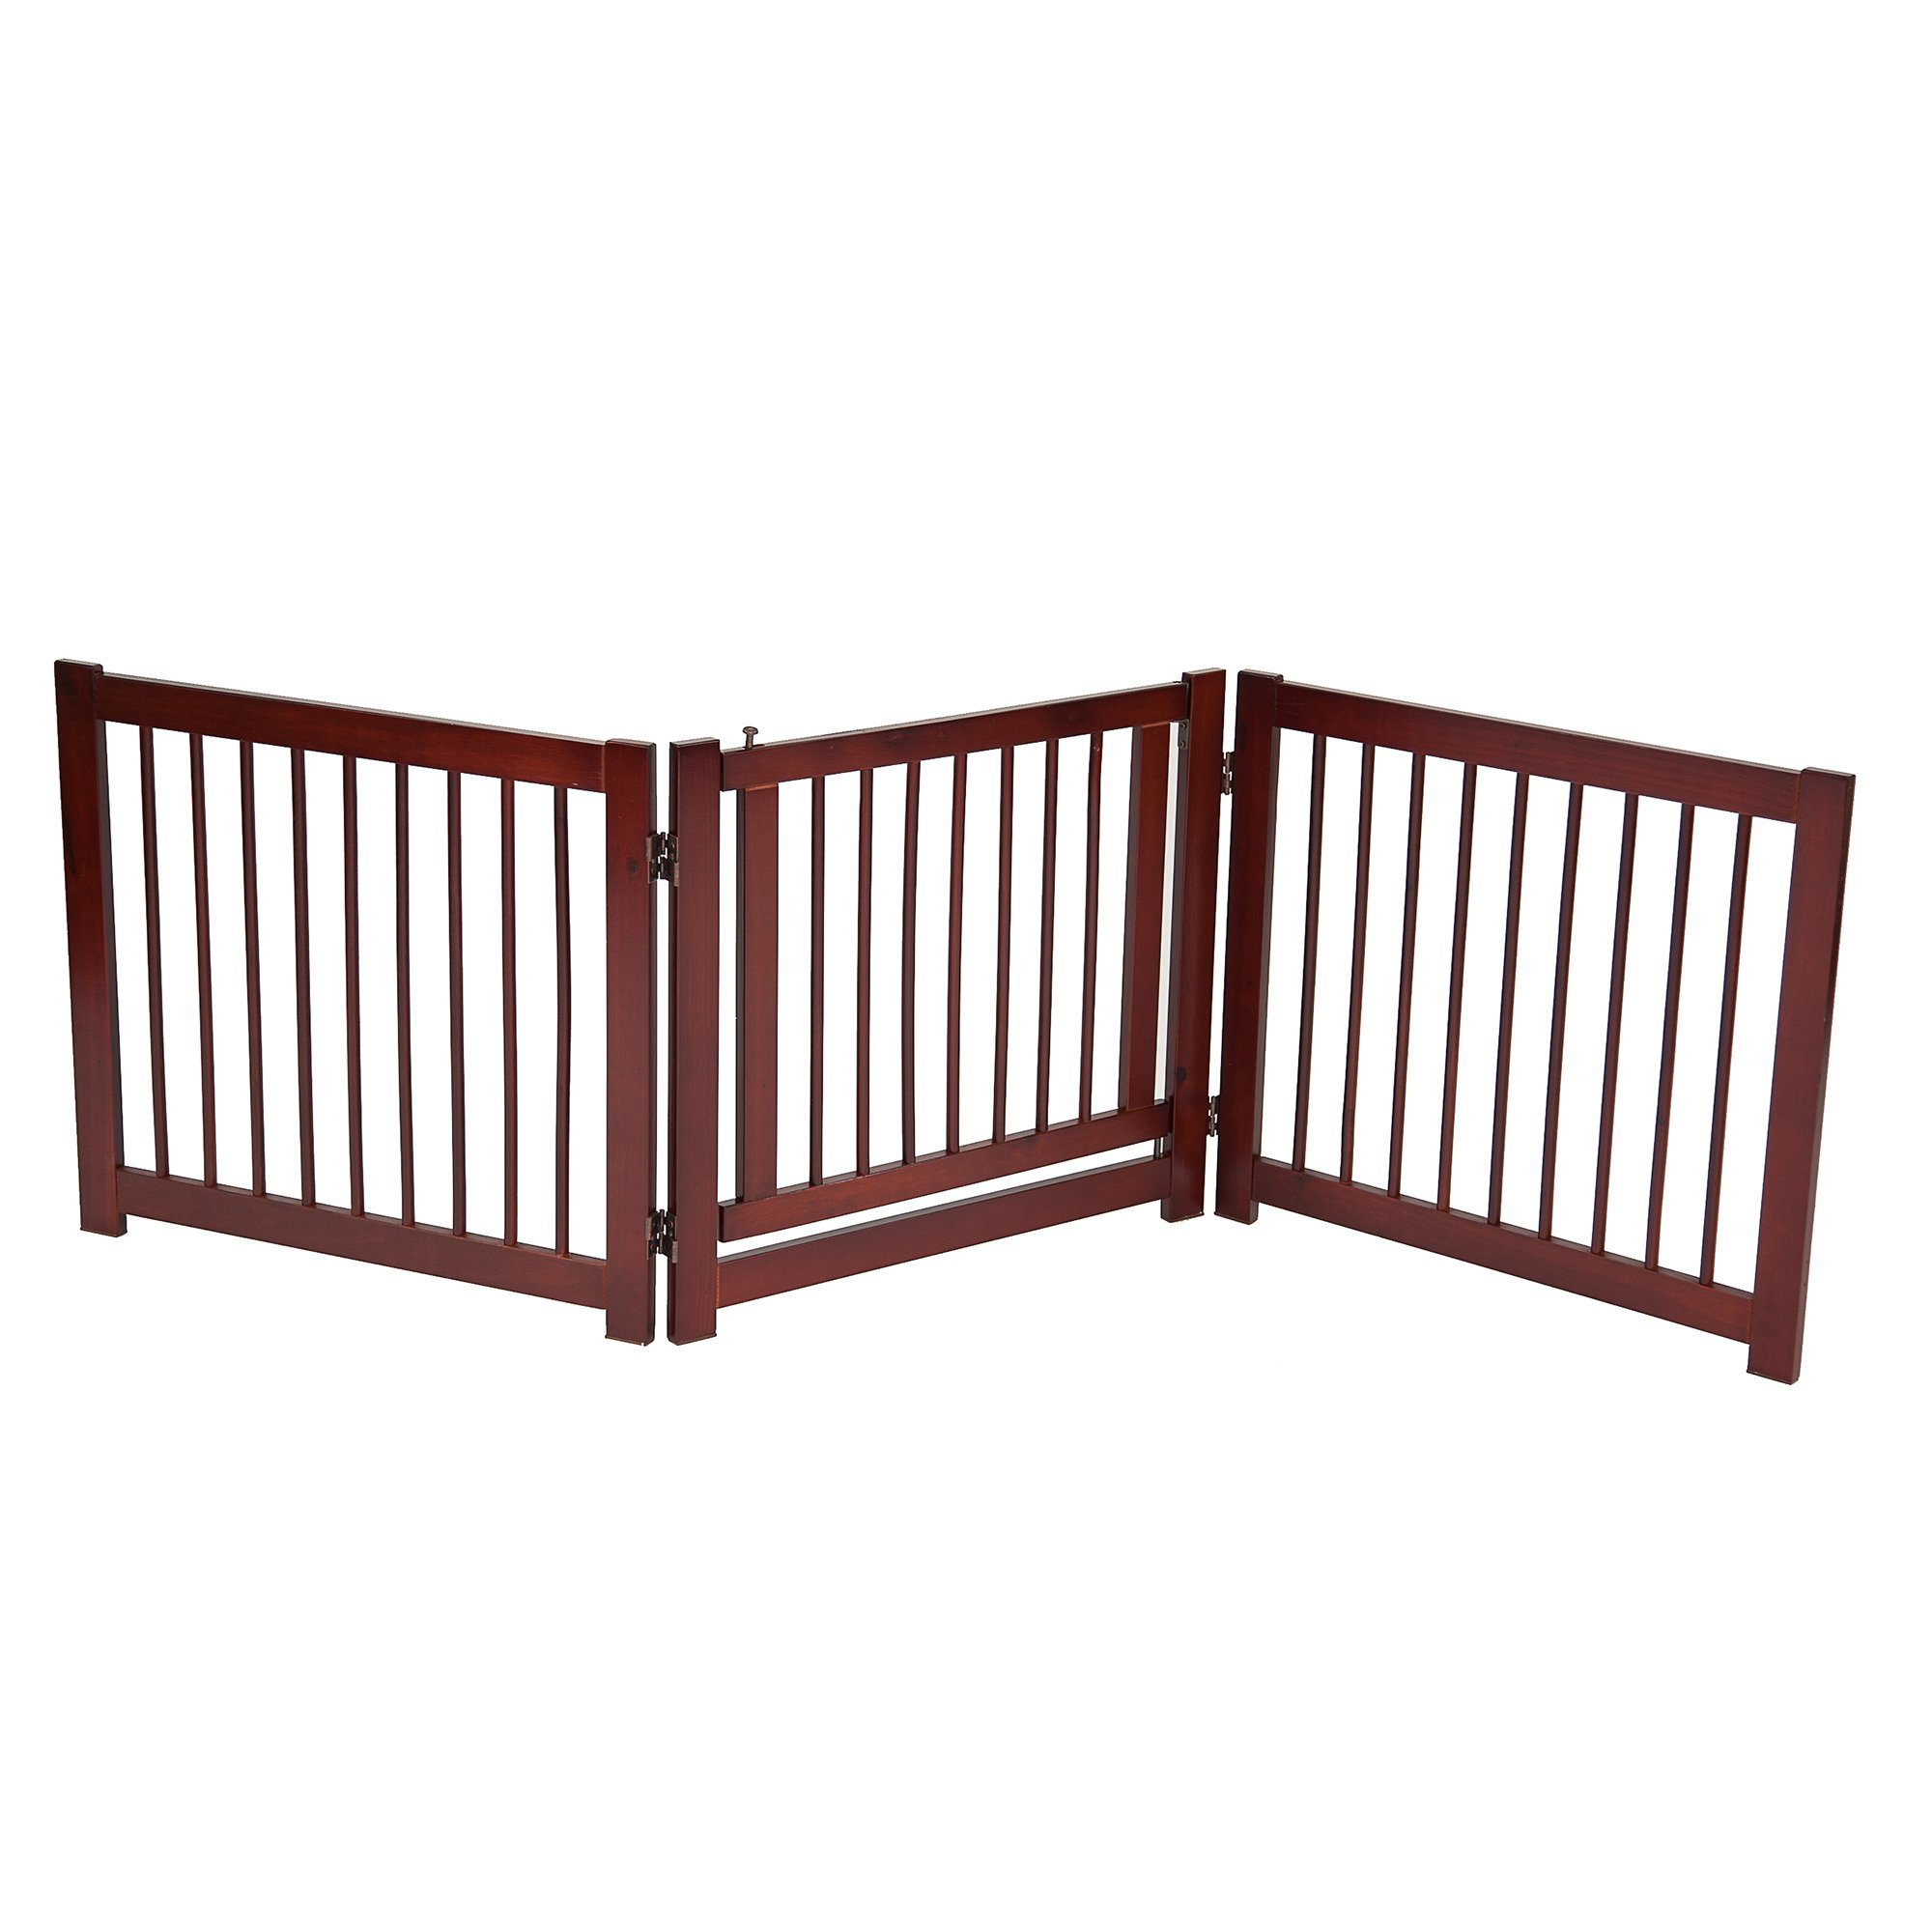 Primetime Petz 360 Degree Configurable Gate With Door, Small, Brown